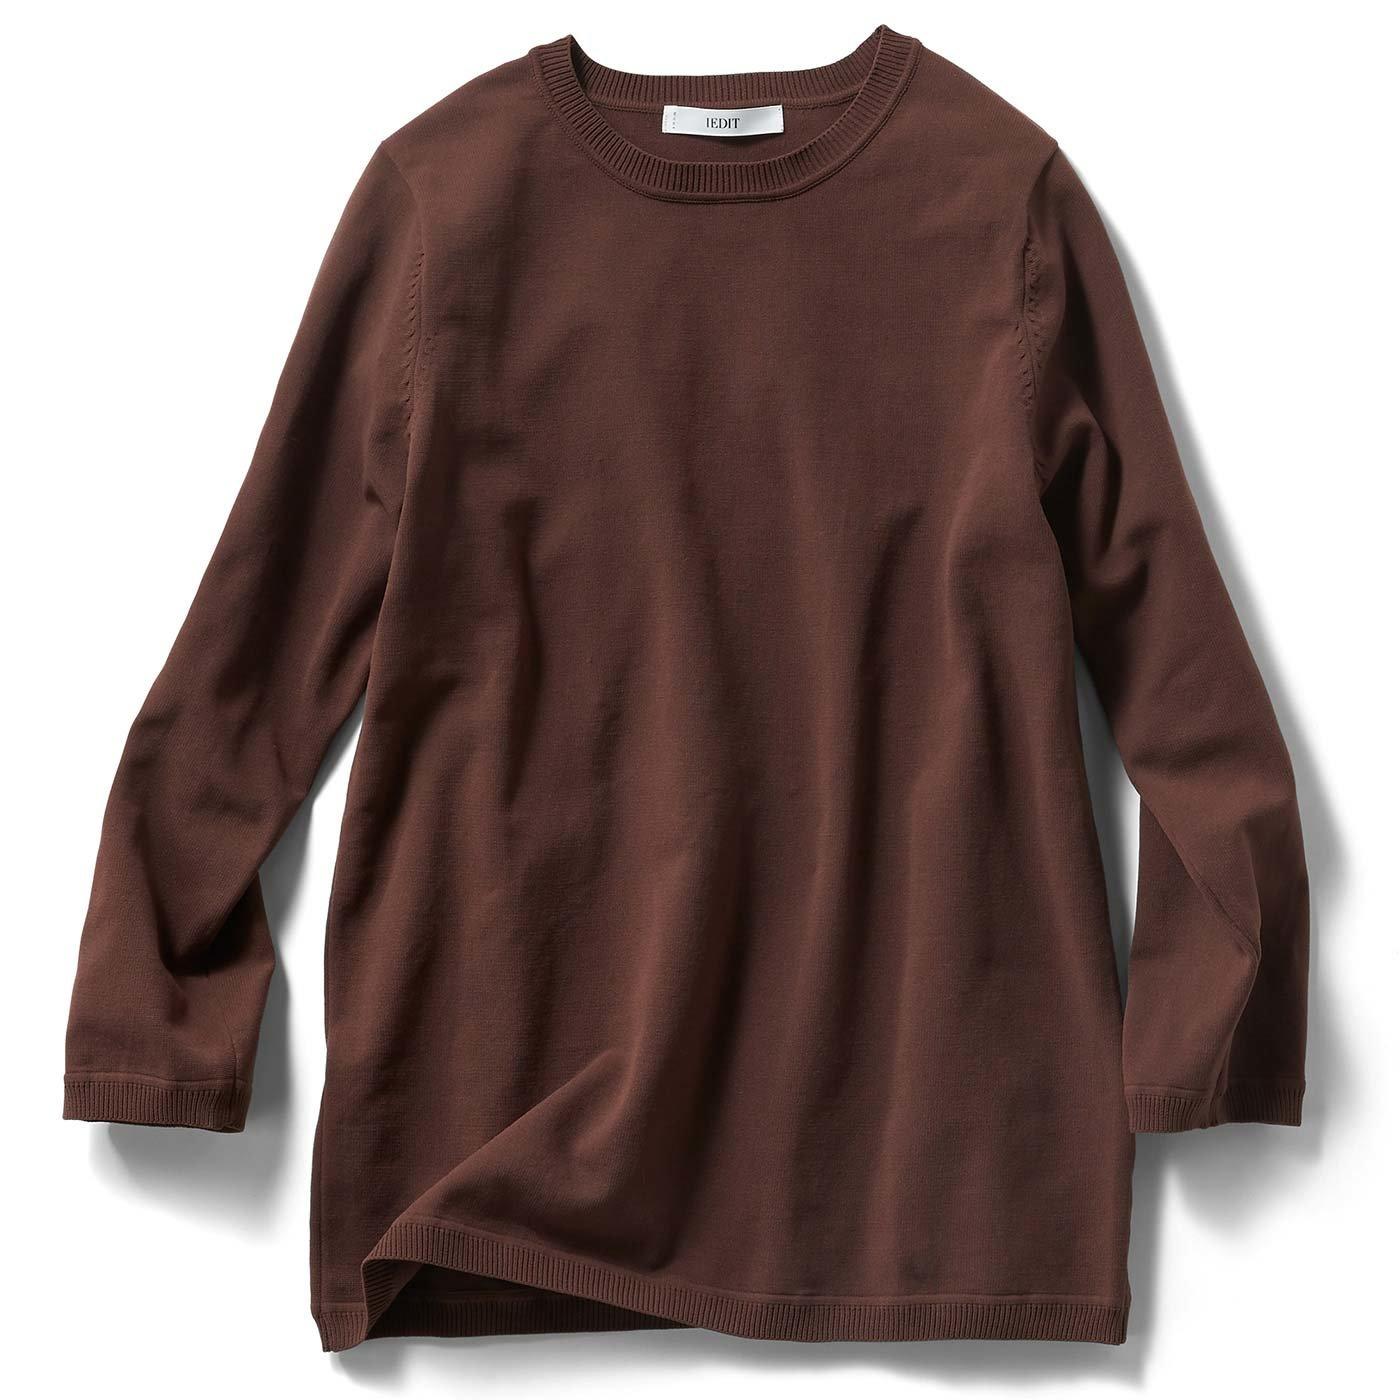 IEDIT ナイロン素材のTシャツ感覚バウンドニット〈ブラウン〉